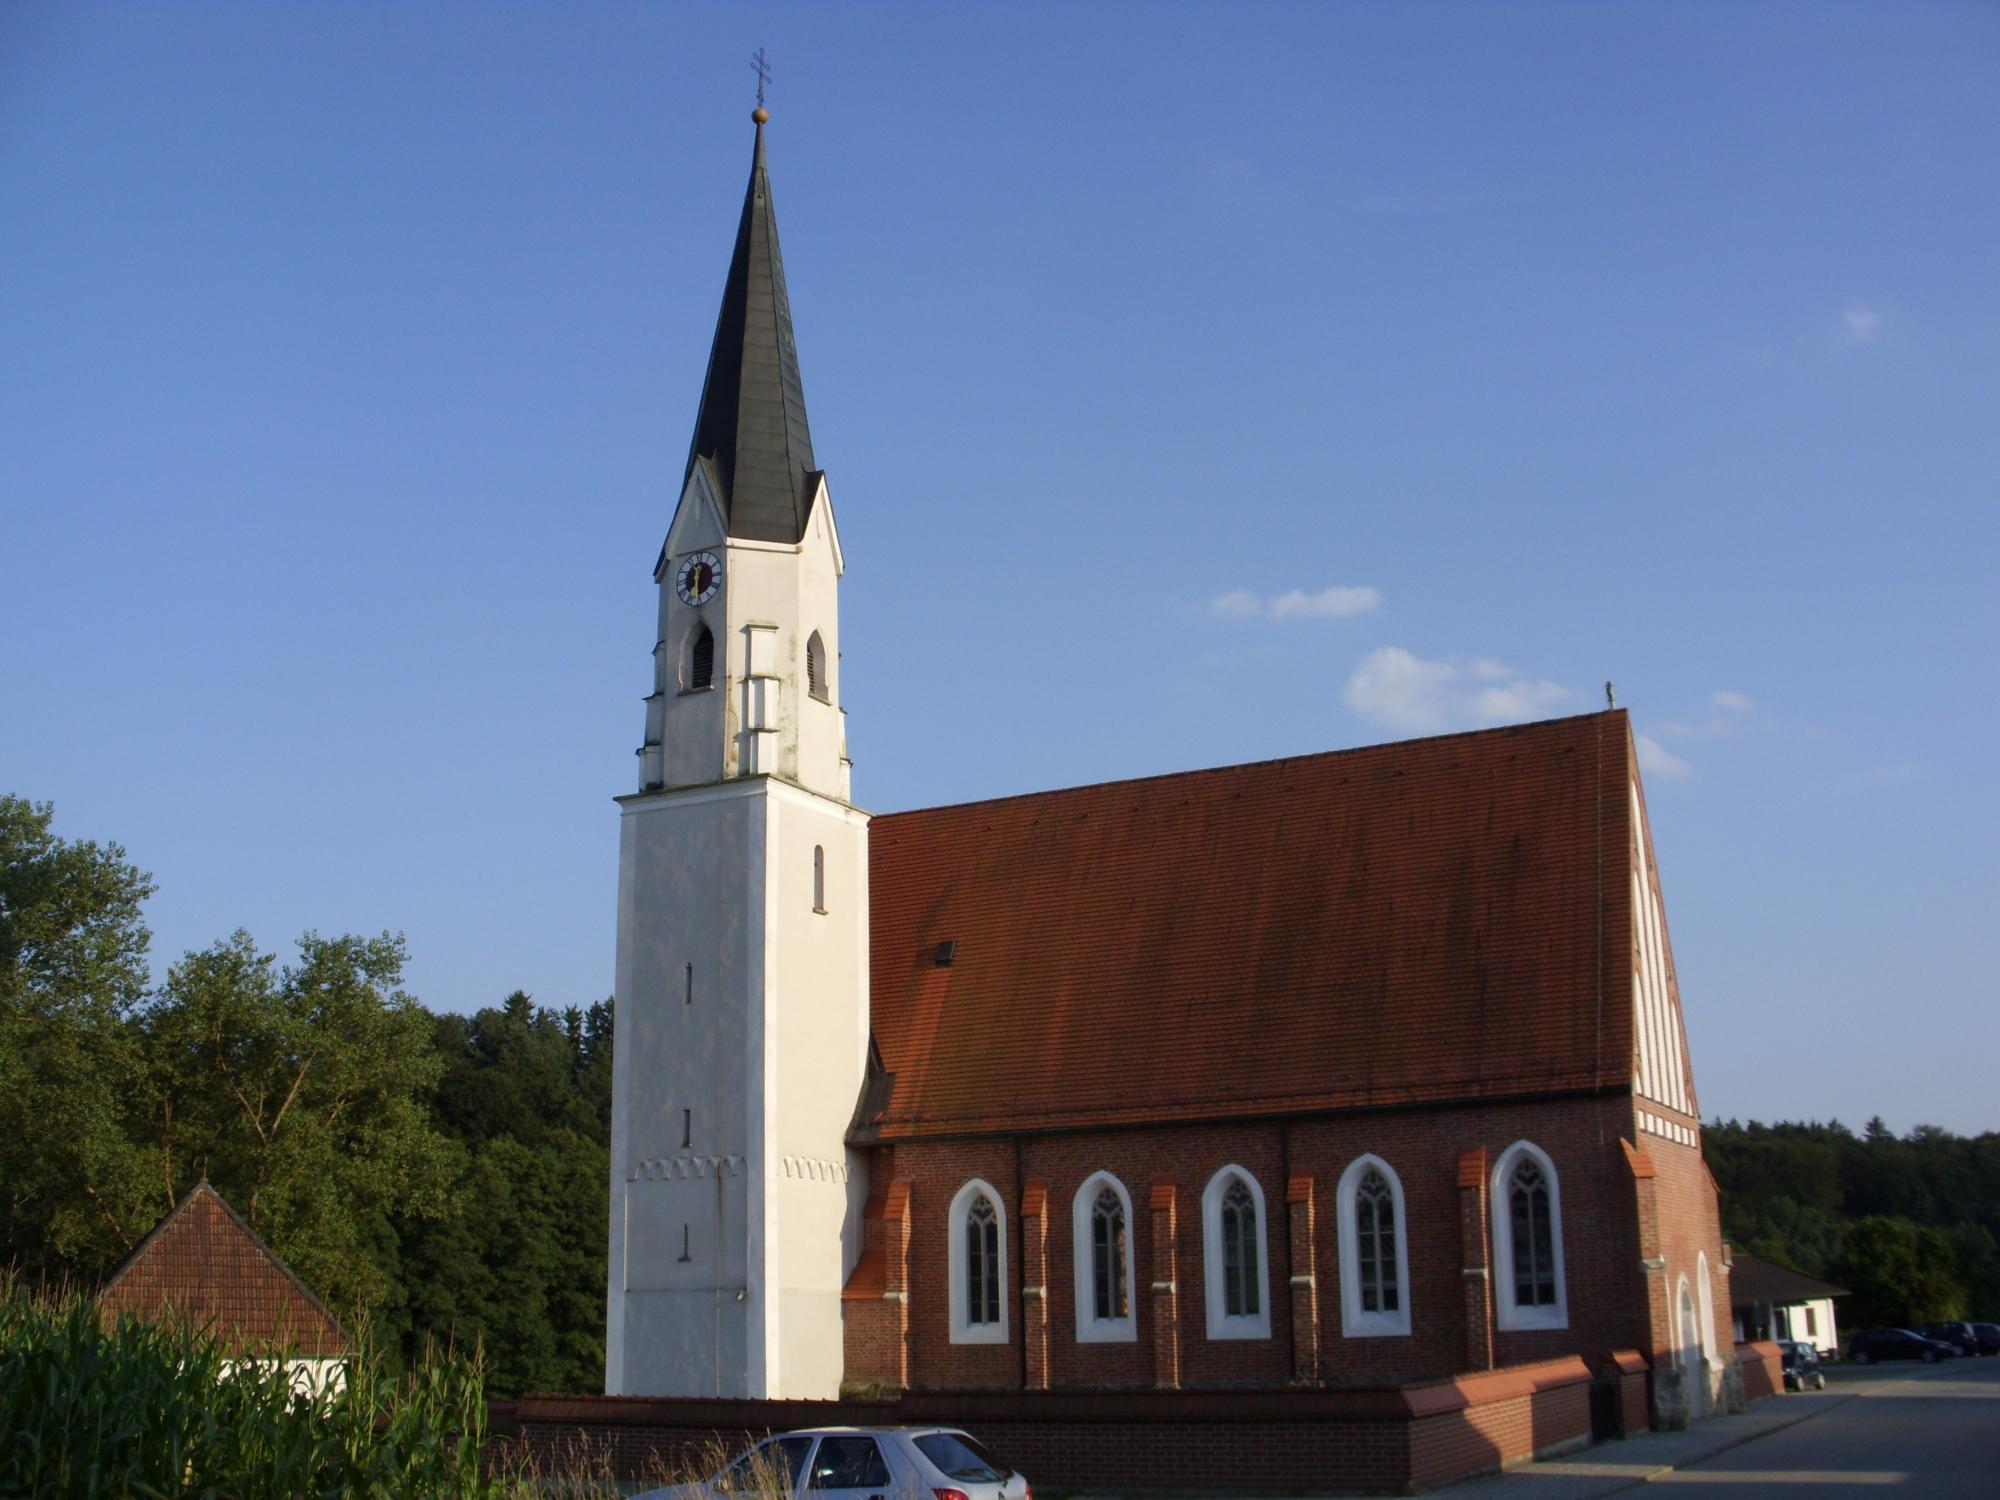 Filialkirche-St-Johannes_Nopplin